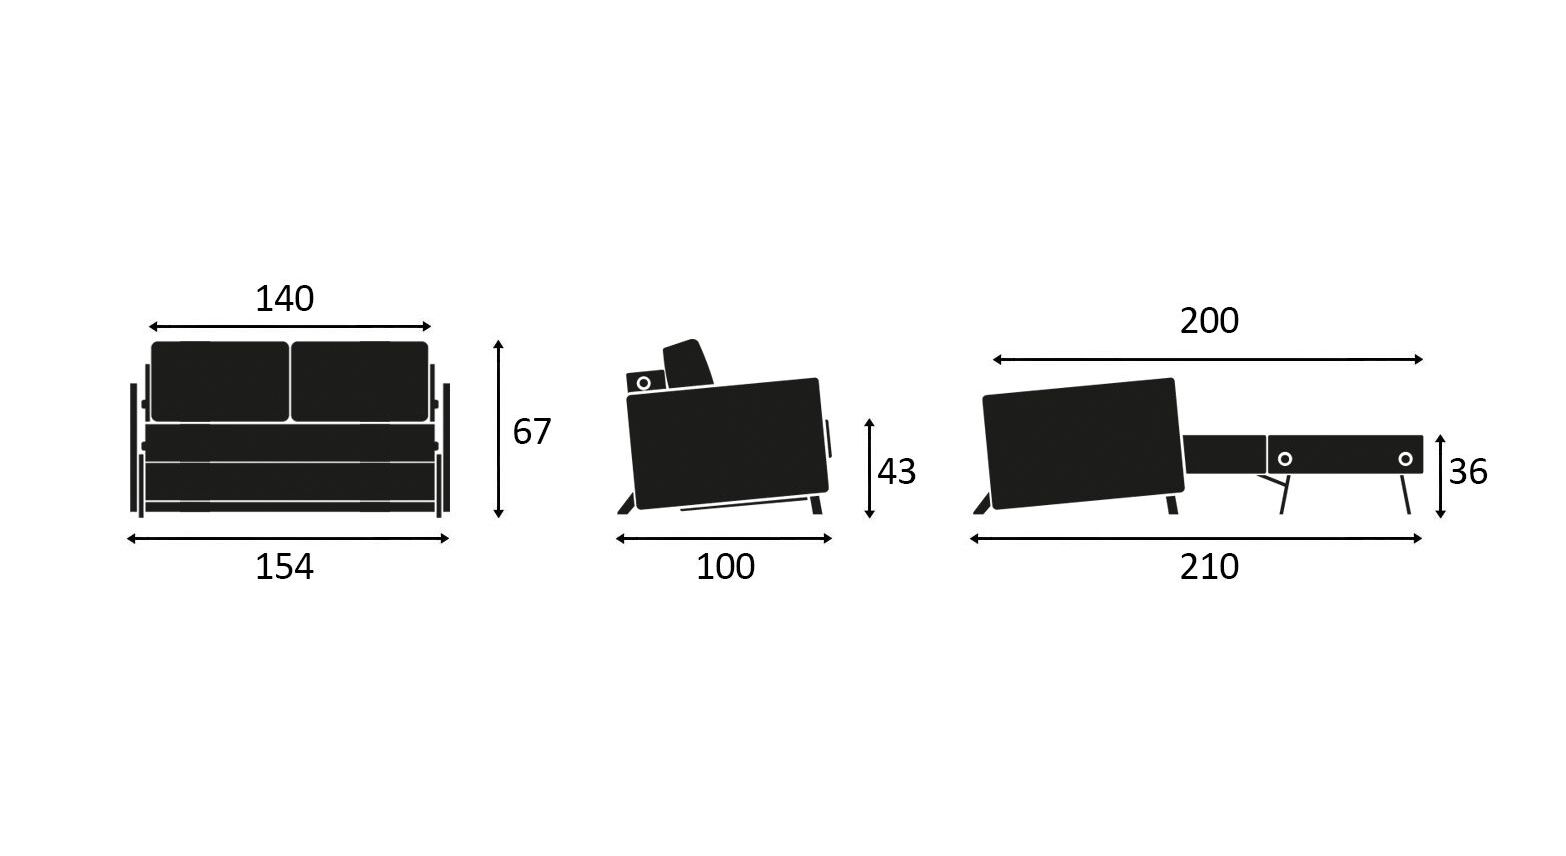 Maßgrafik zum Schlafsofa Kuda in 140 cm Breite